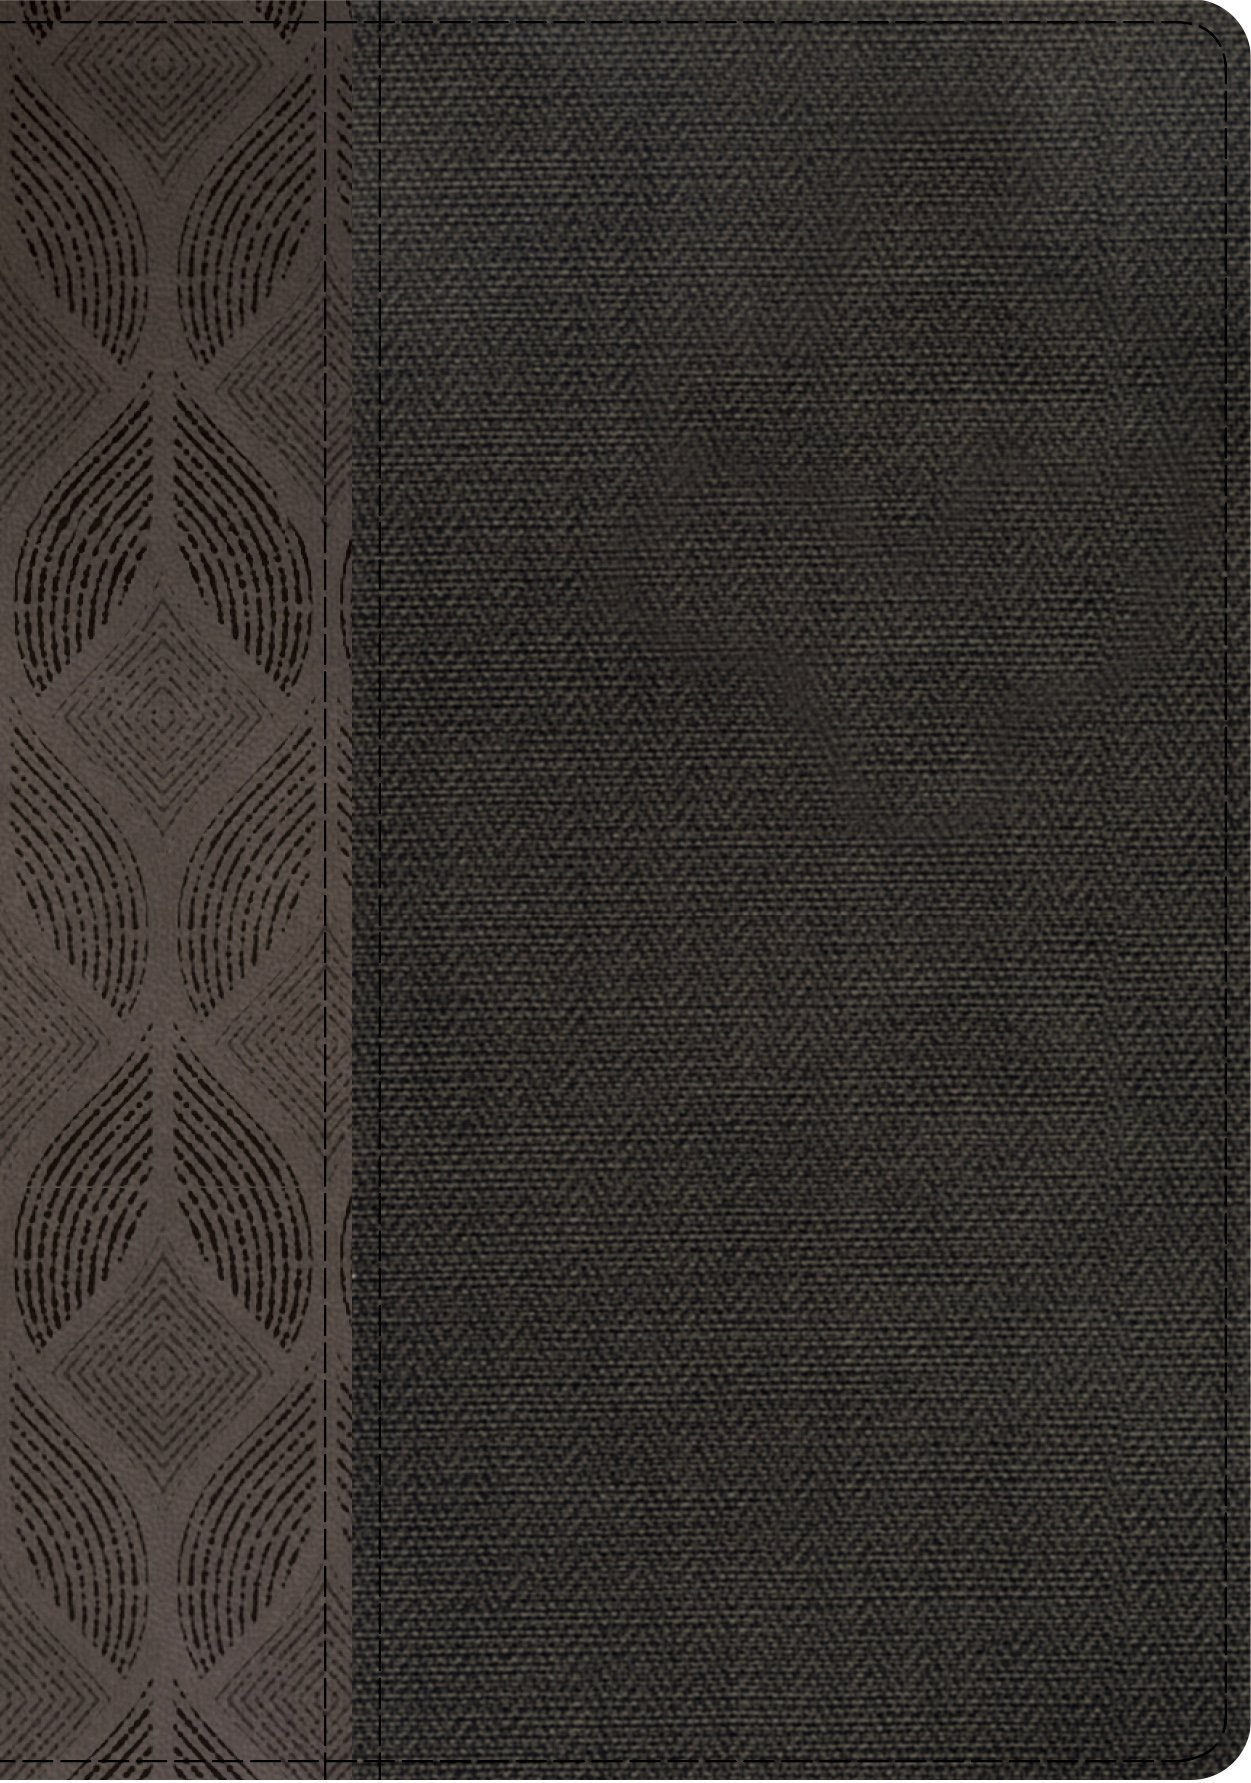 RVR 1960 Biblia Compacta Letra Grande, geométrico/twill gris símil piel con índice (Spanish Edition) pdf epub